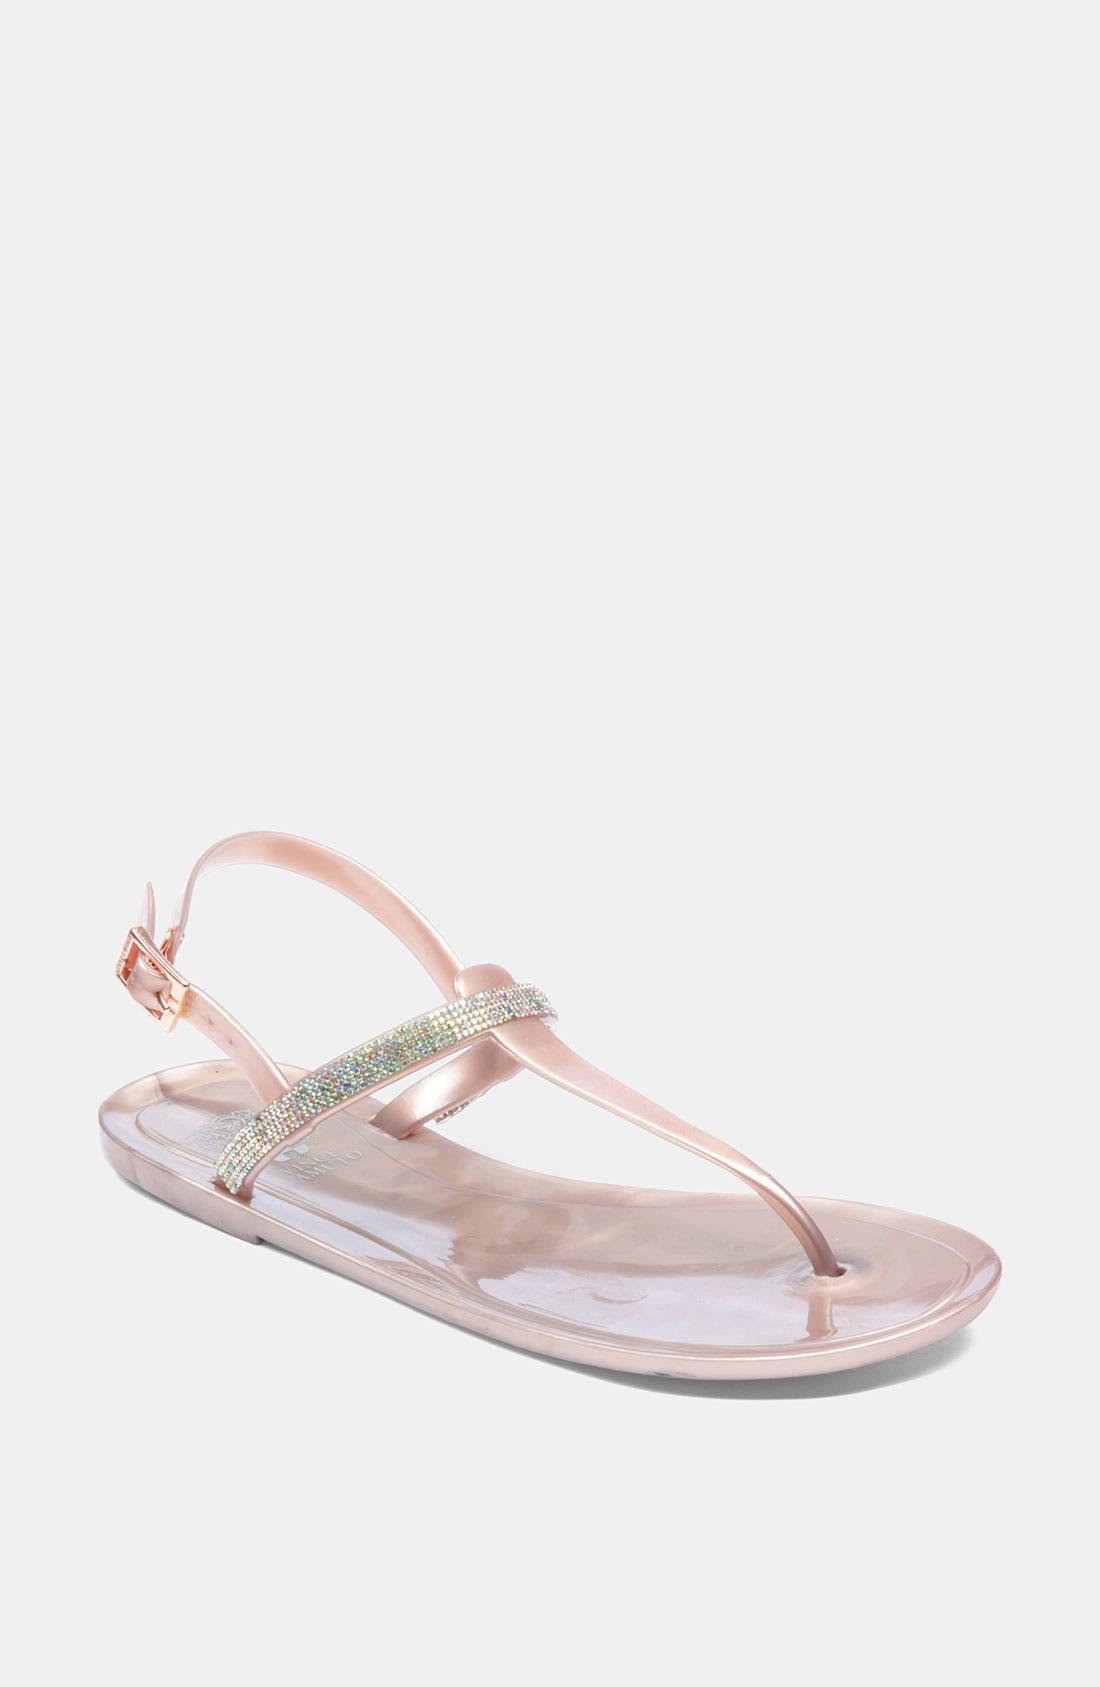 Main Image - Vince Camuto 'Udele' Sandal